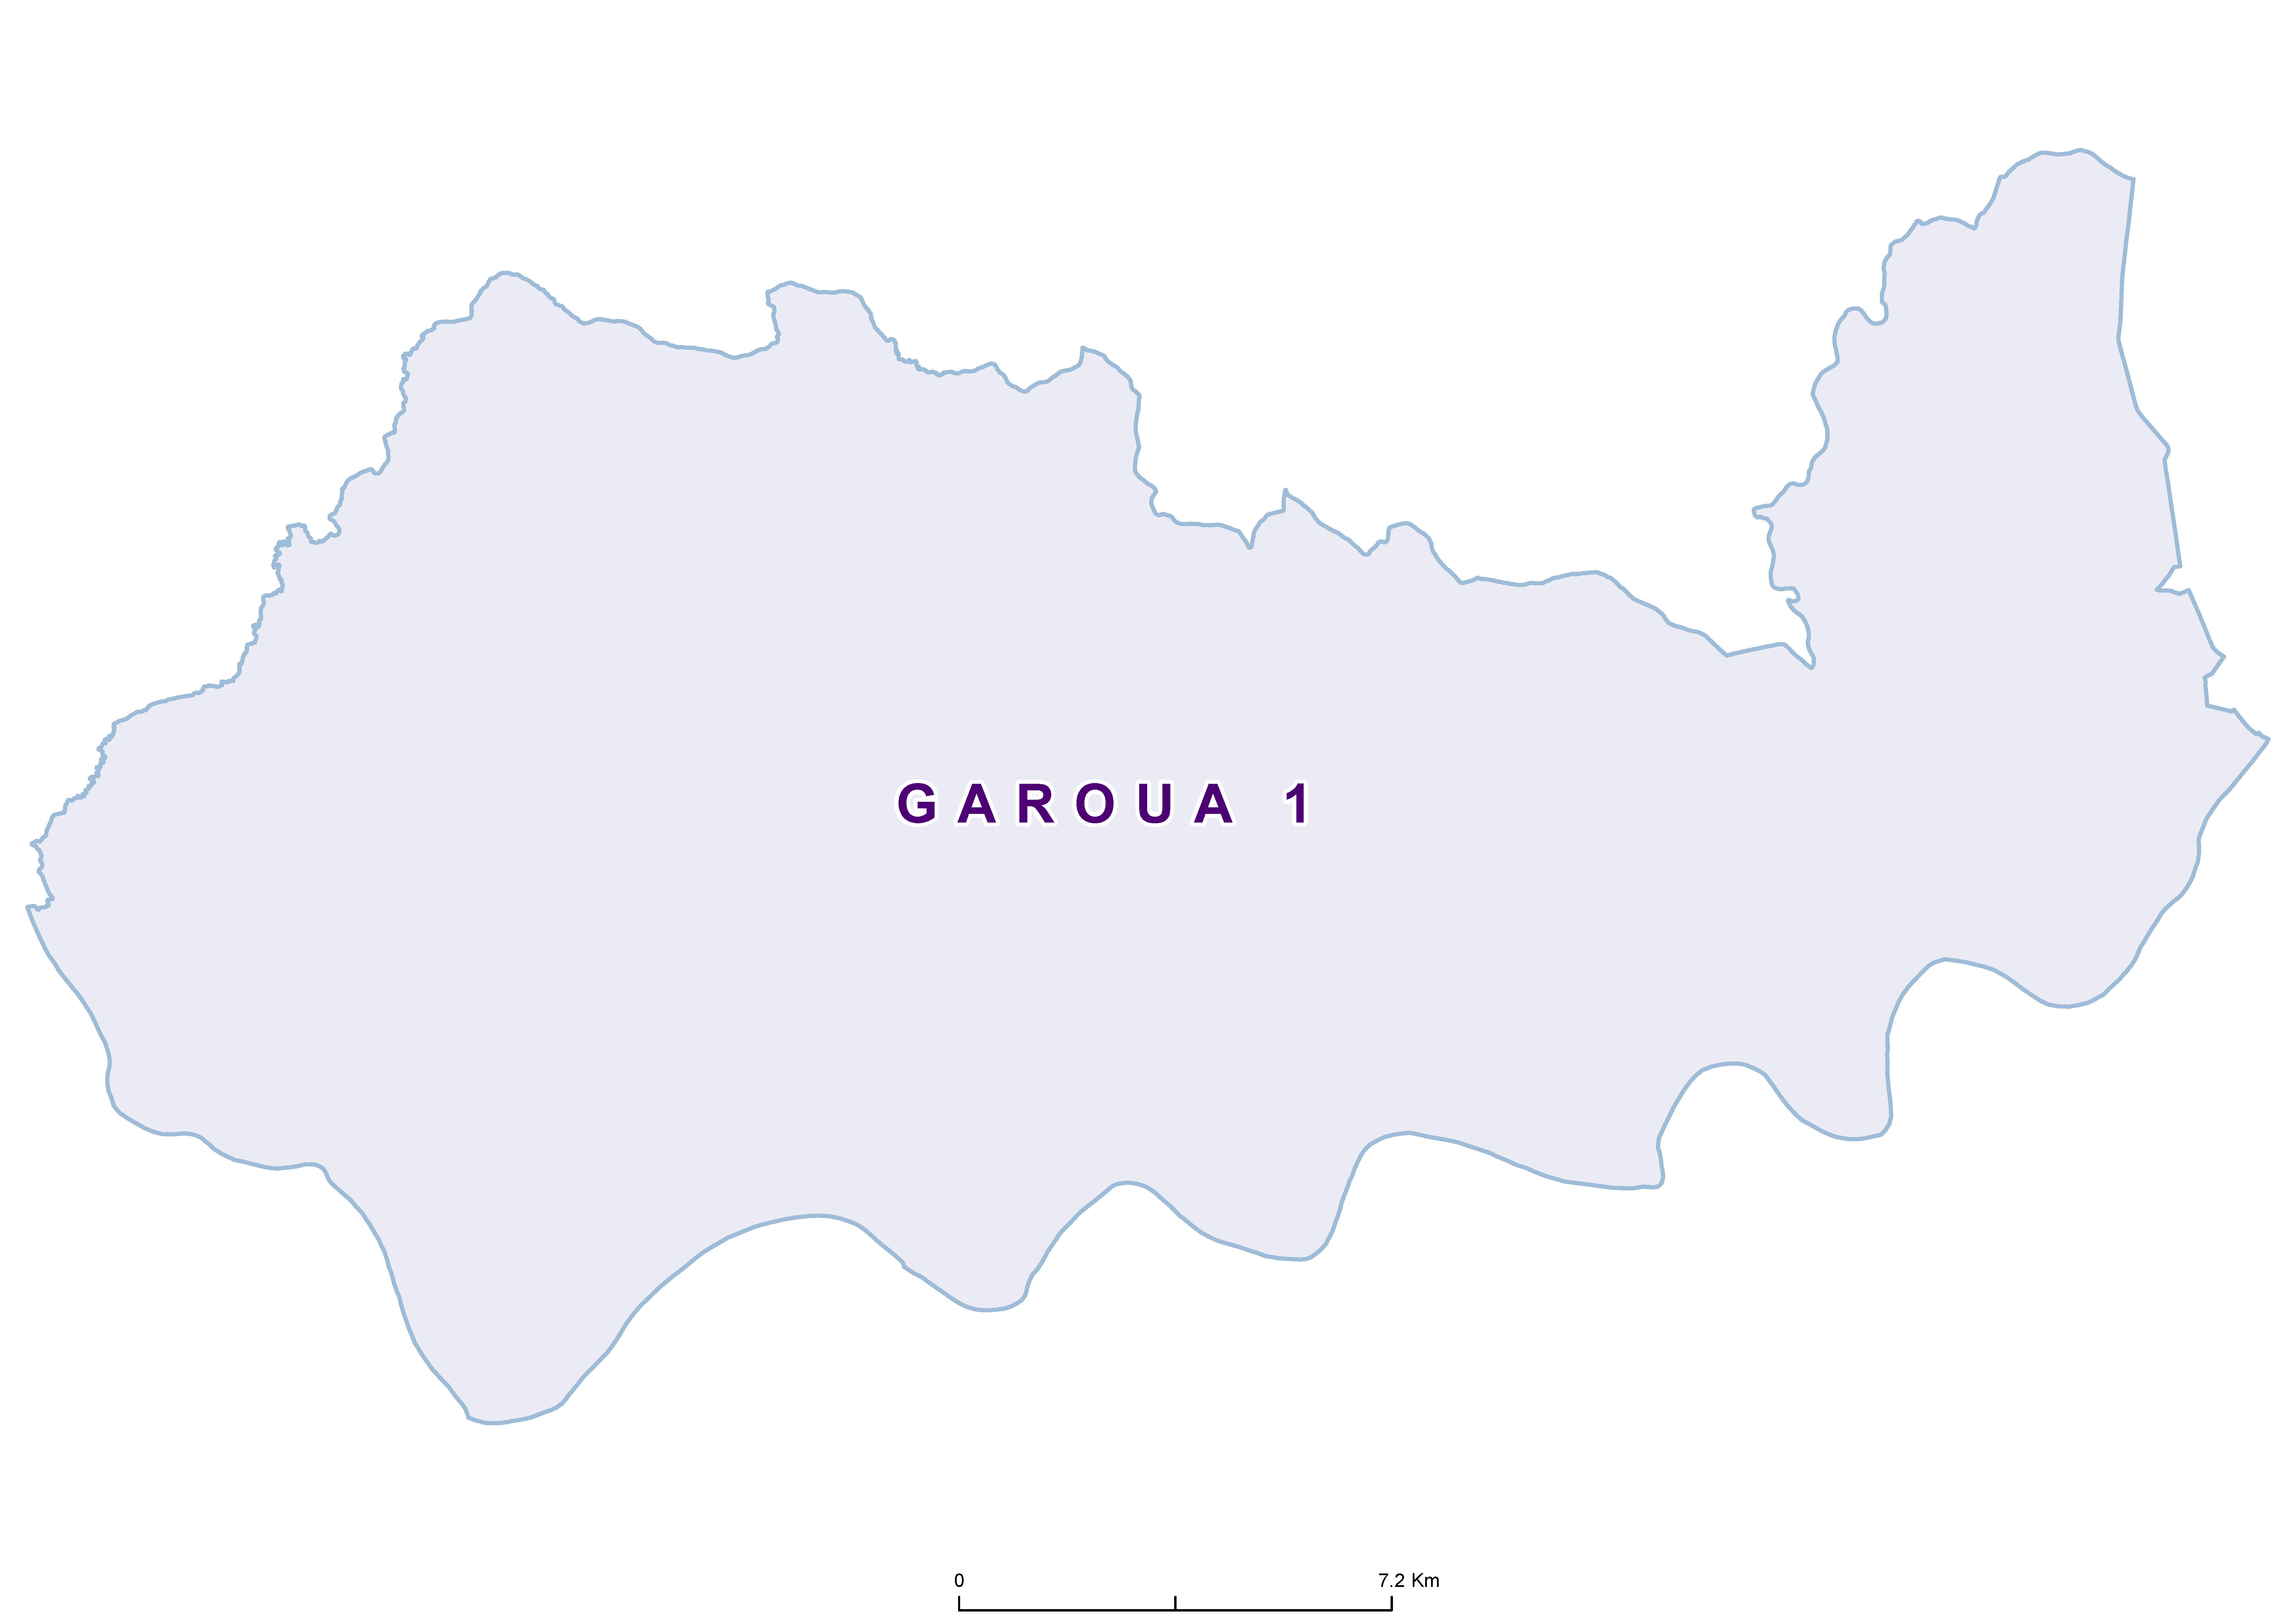 Garoua 1 Mean SCH 19850001